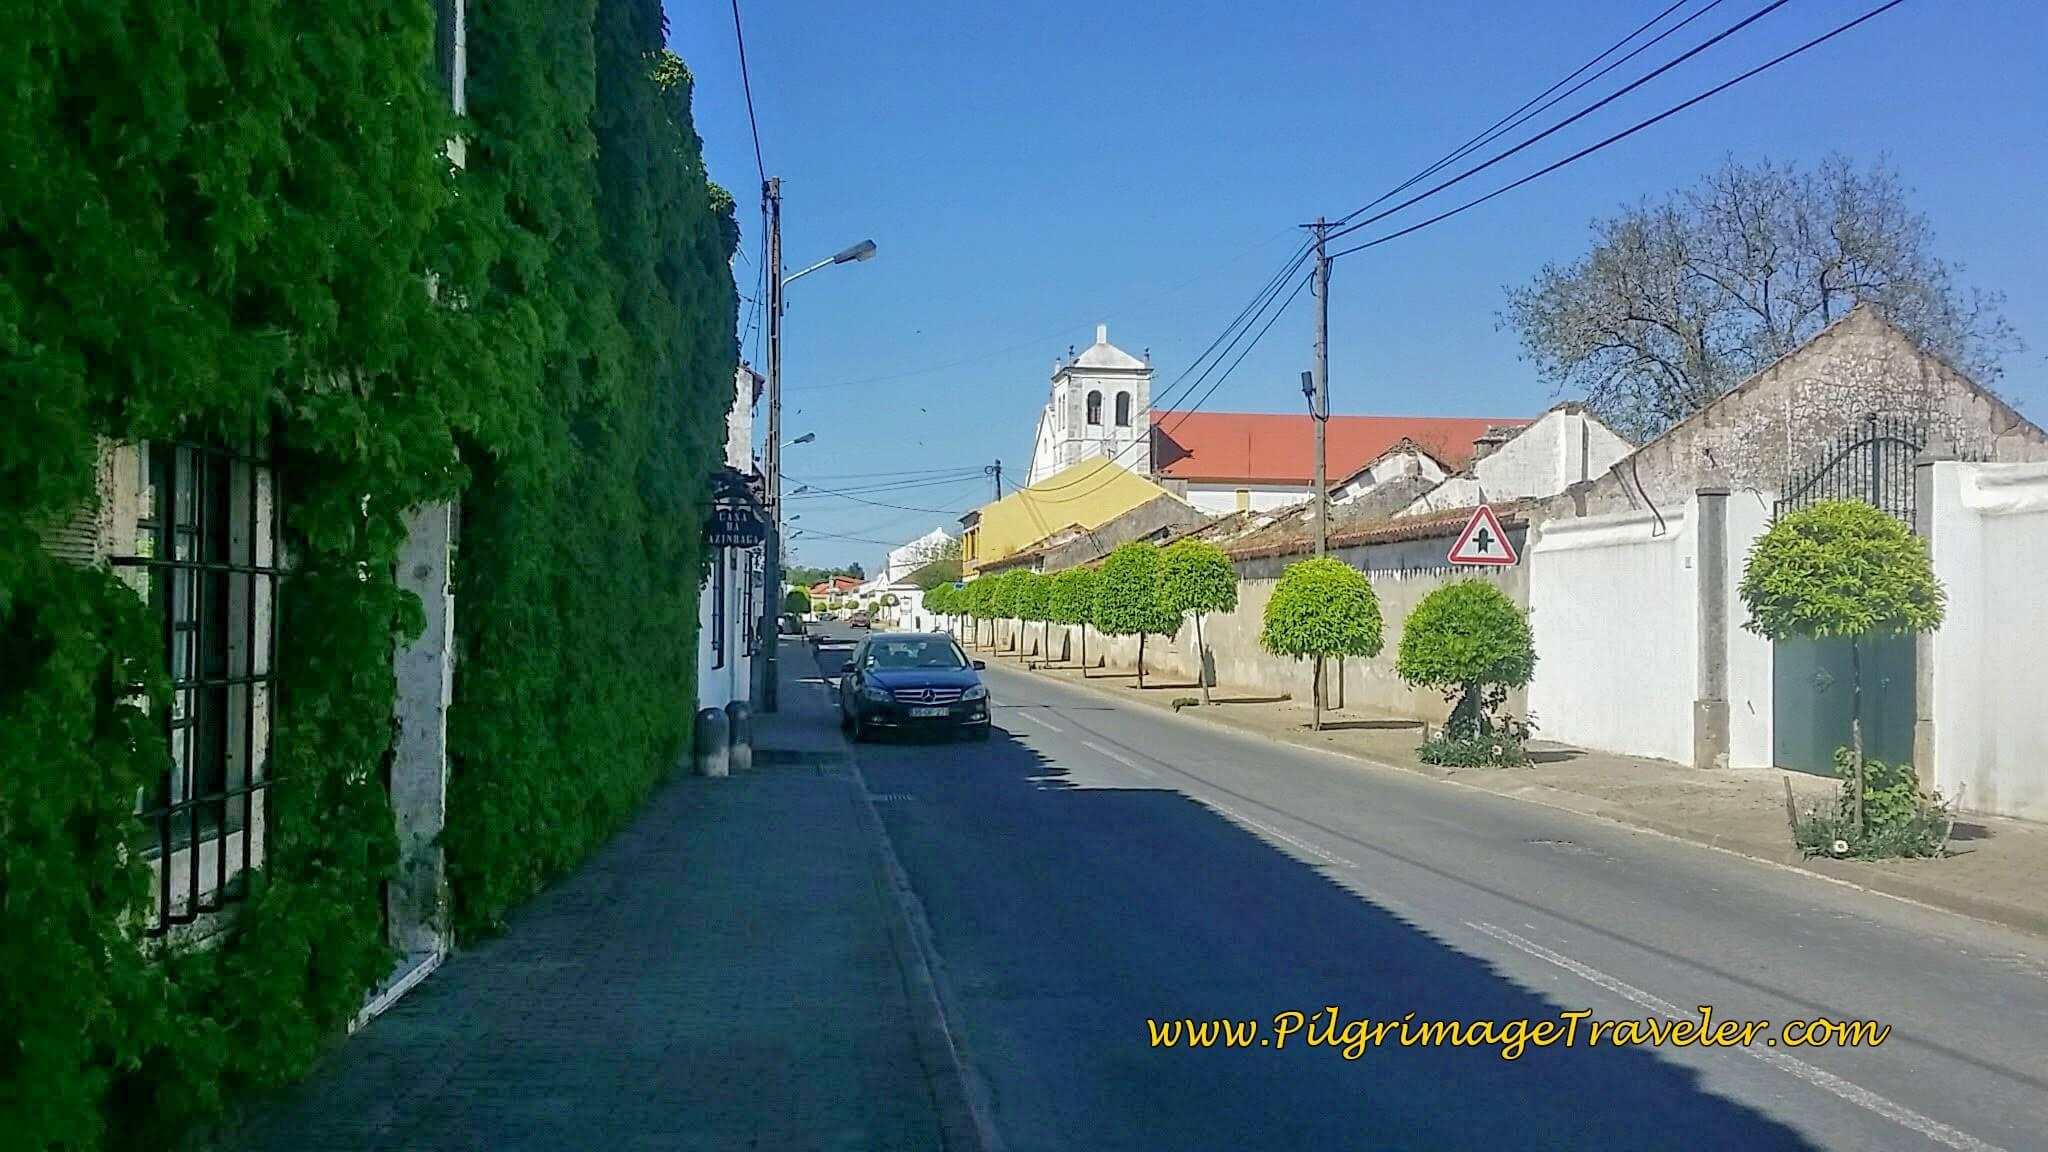 Walking Through the Center of Azinhaga on the Rua da Misericórdia